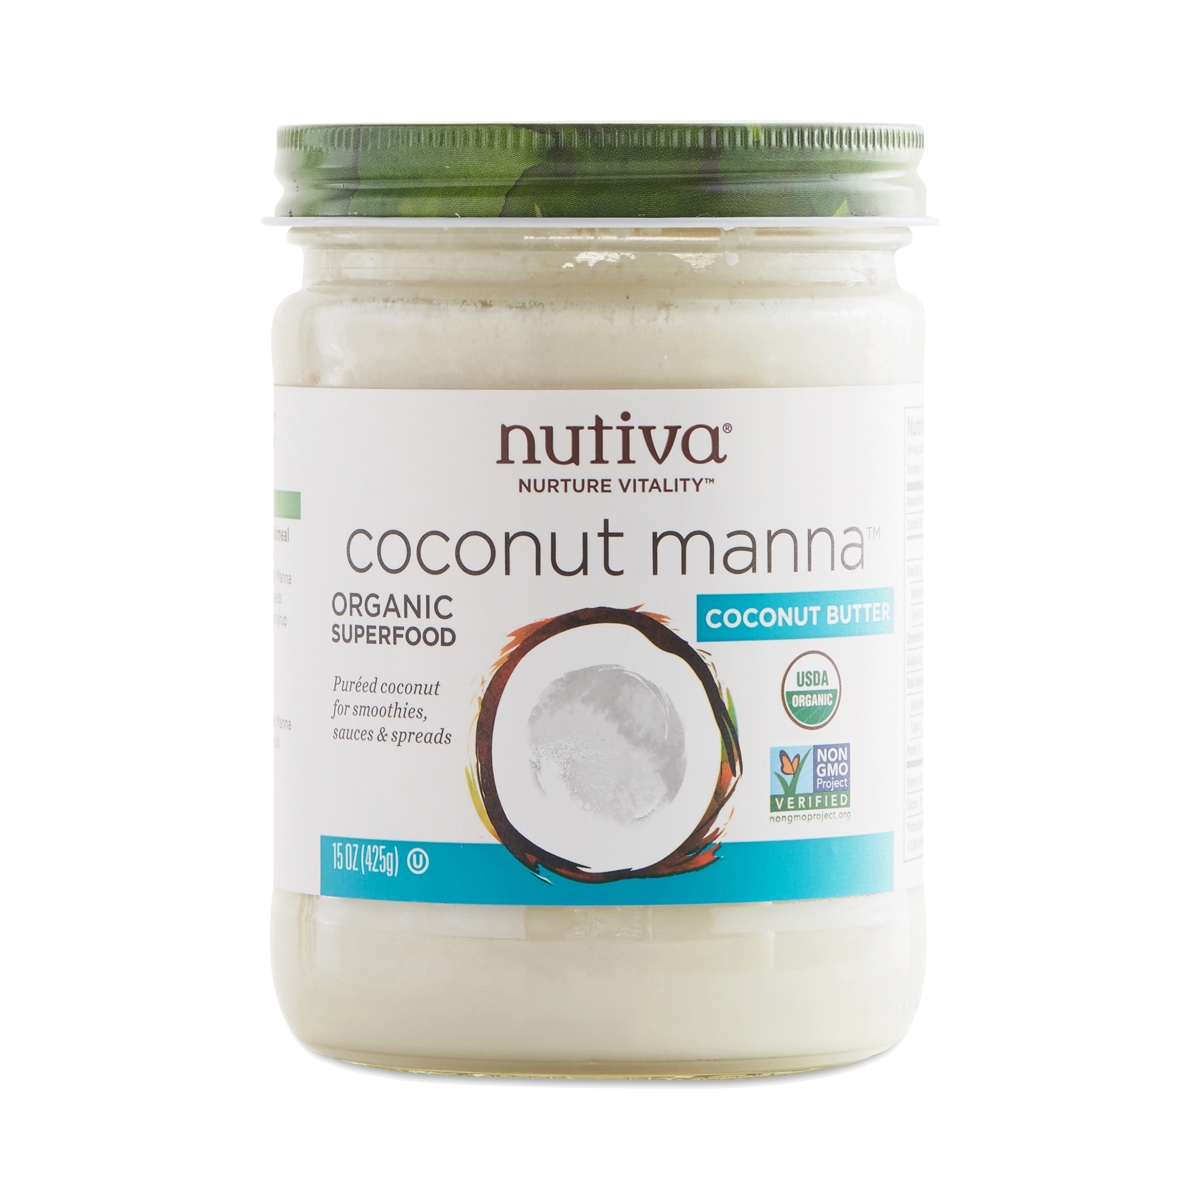 Nutiva Organic Coconut Manna 15 oz jar